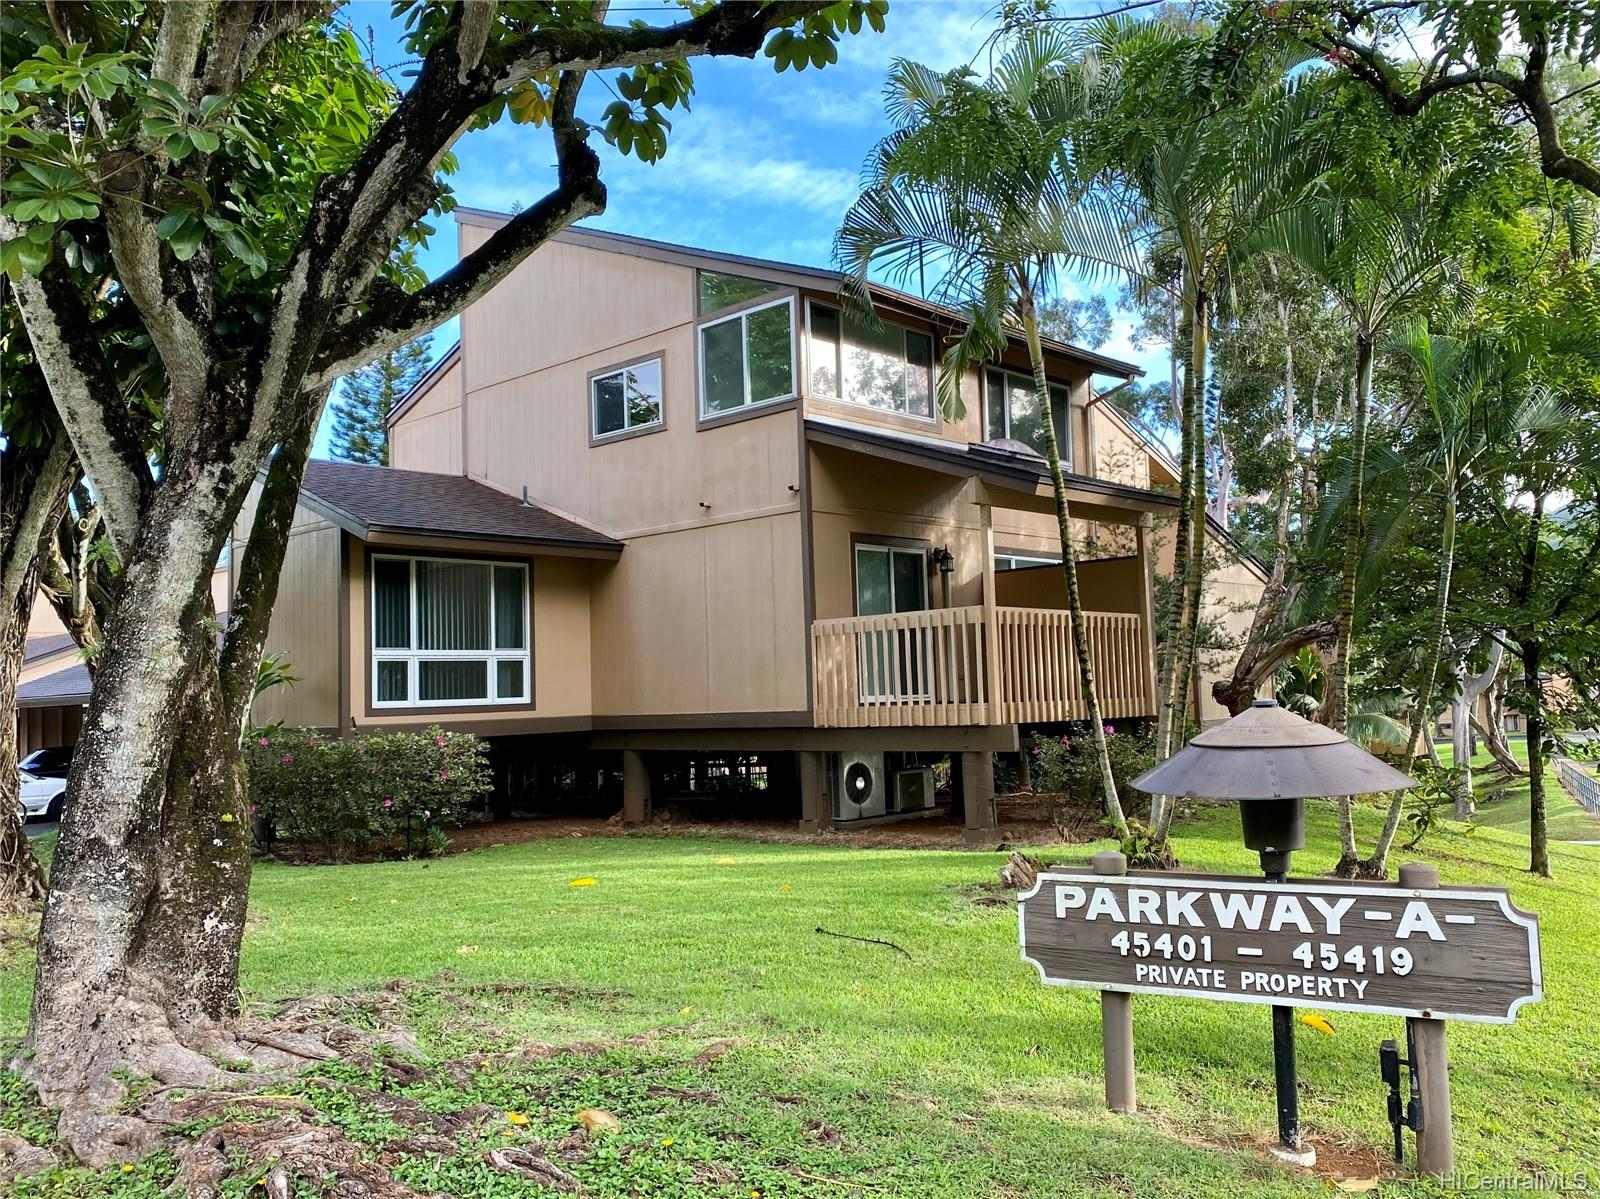 Parkway A condo # 32, Kaneohe, Hawaii - photo 1 of 13